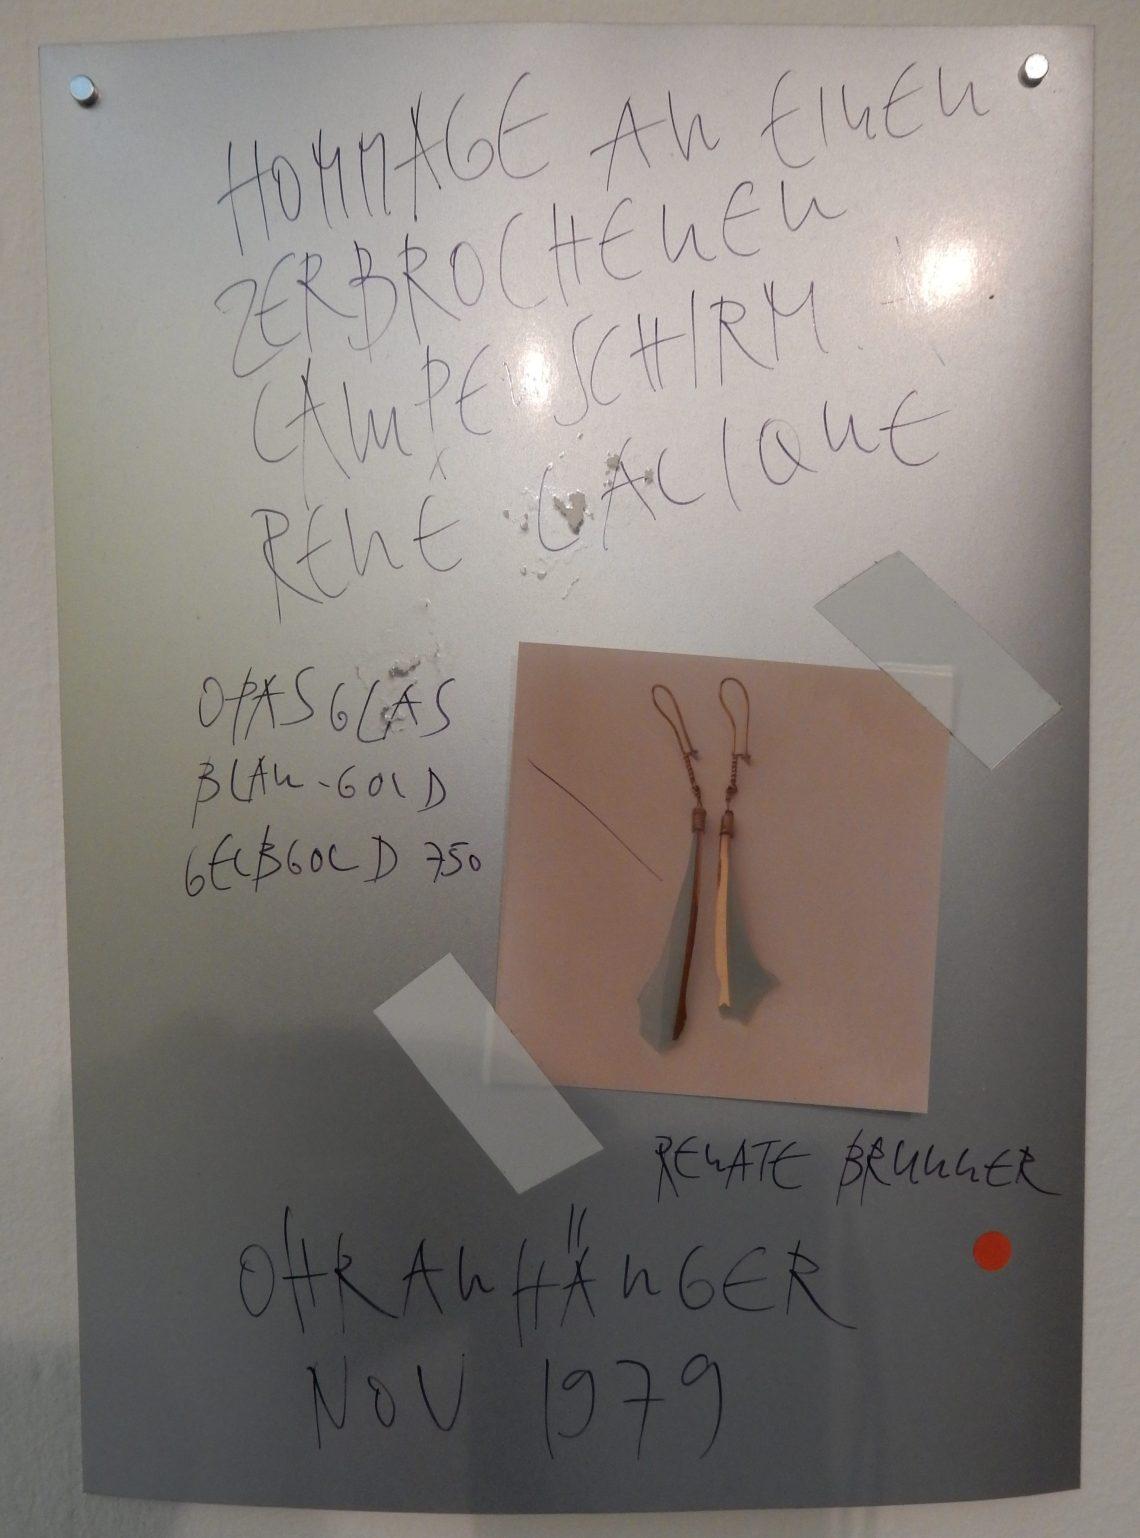 Bernhard Schobinger, tekening, 1980-1990, Private Confessions, CODA, 2016. Foto Esther Doornbusch©